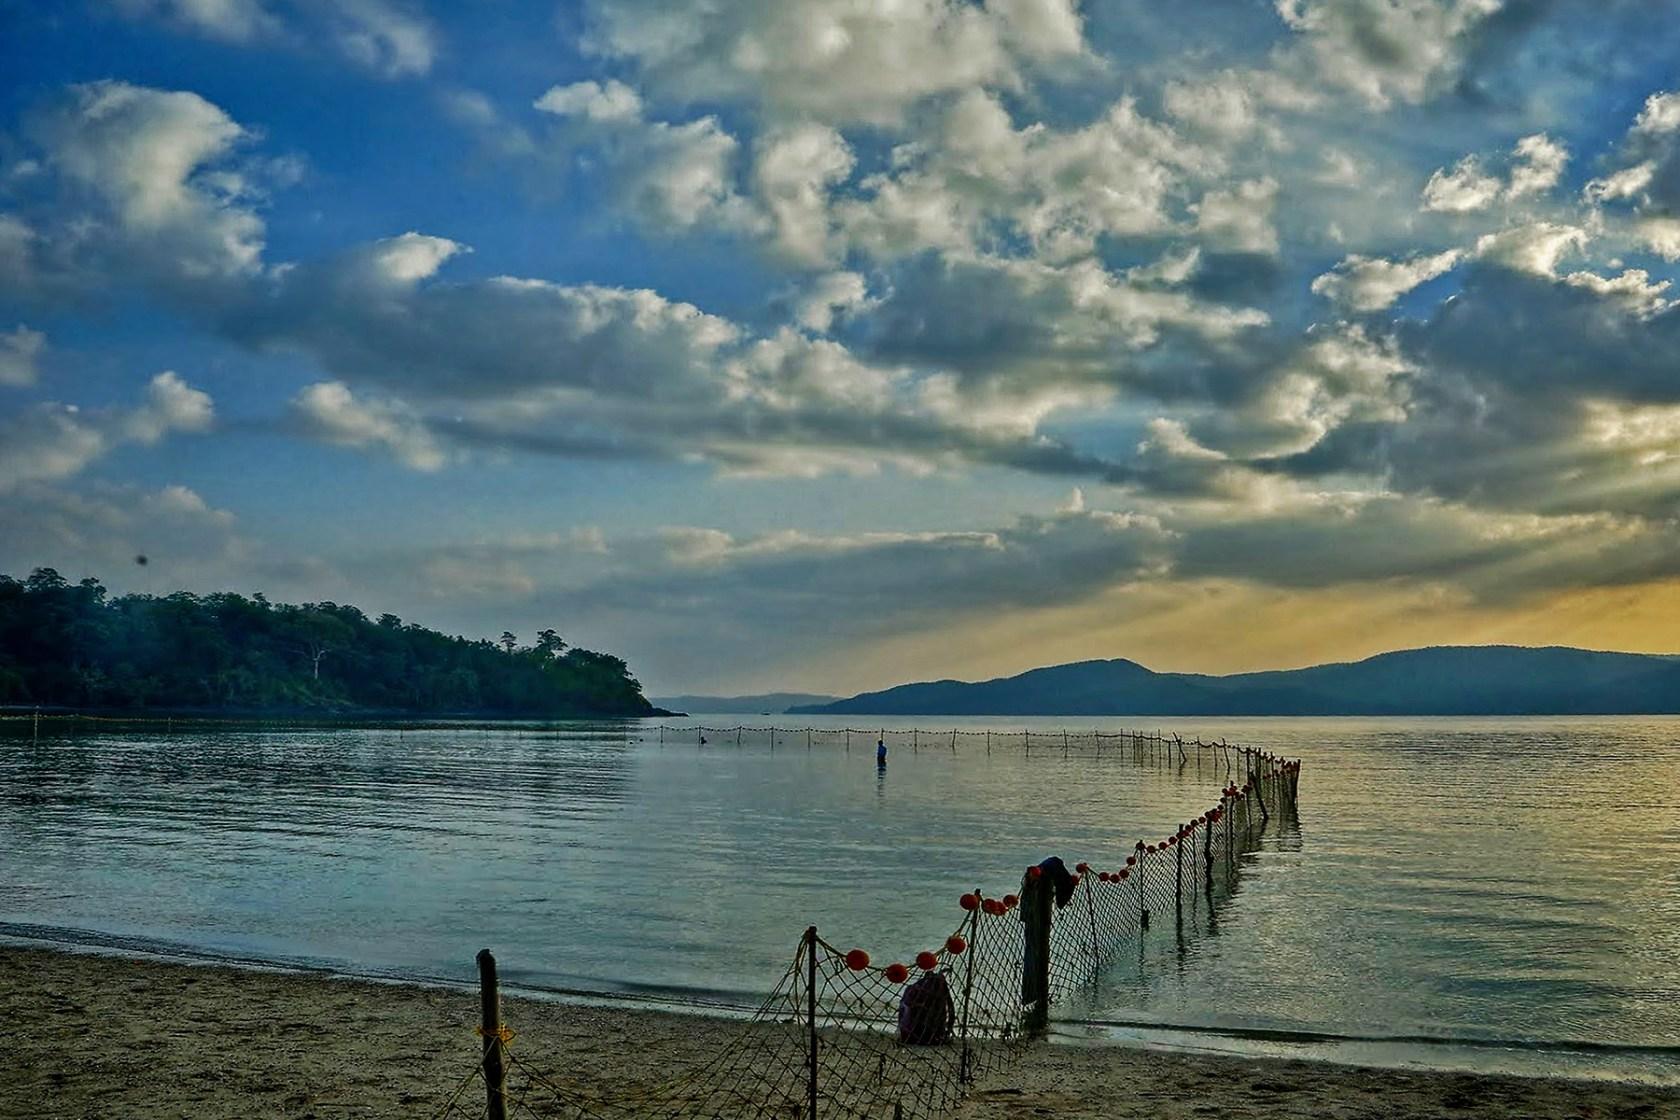 Beach-Chidiya-tapu-Island-Shot-With-canon-D-Lens-mm-wallpaper-wp5803863